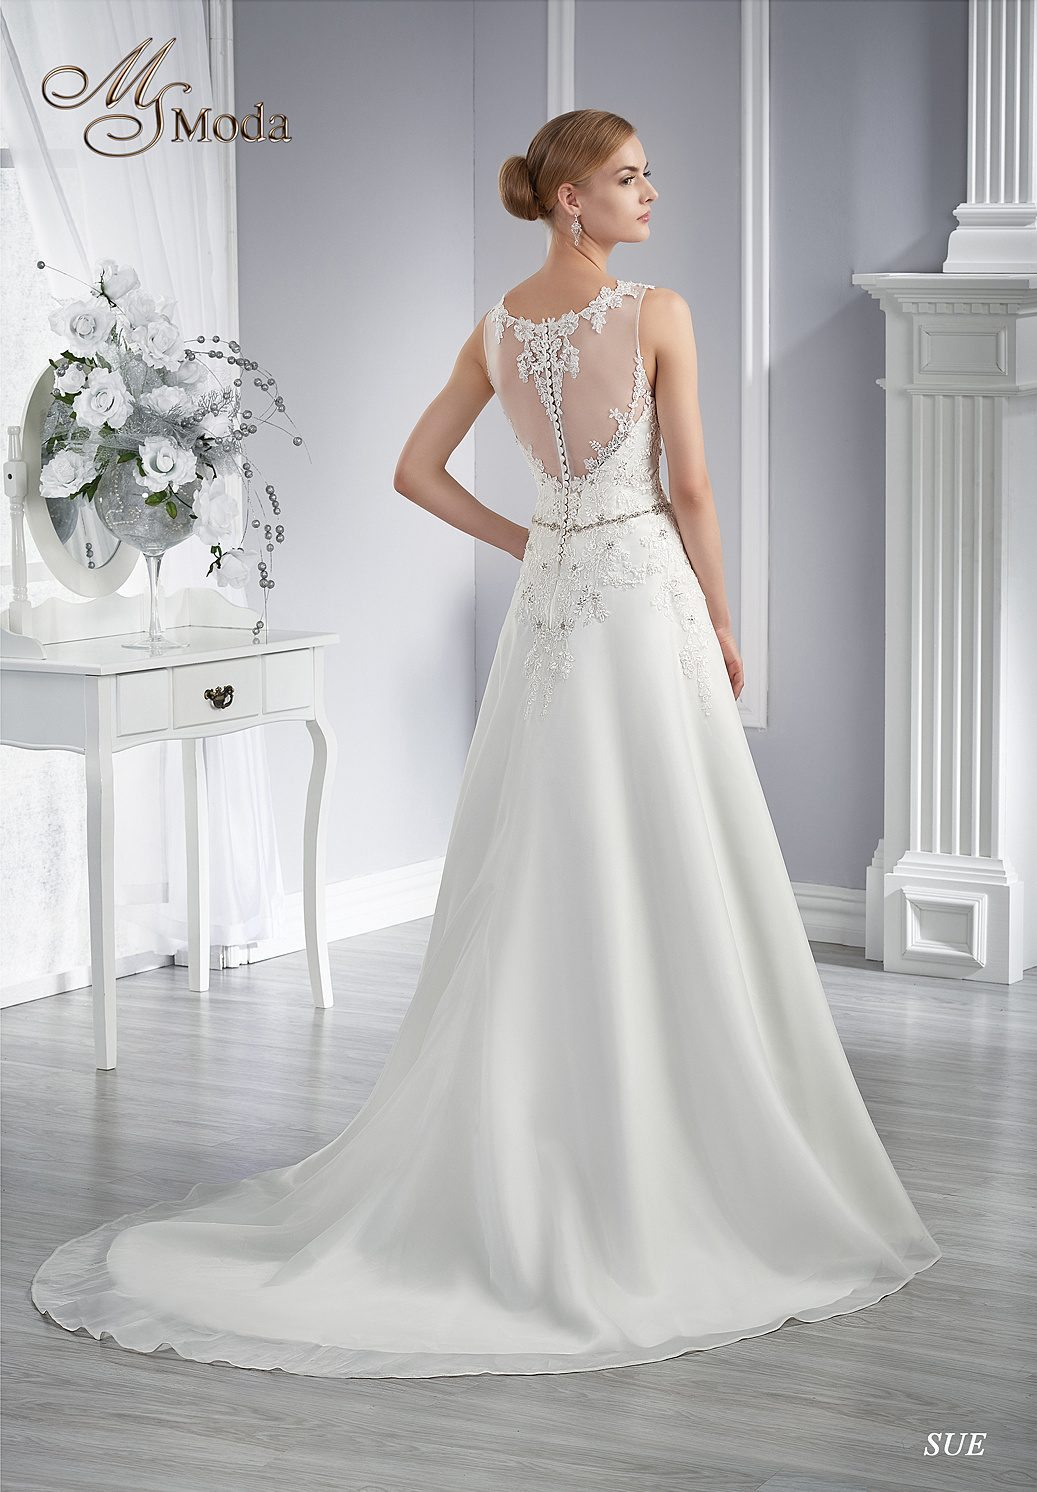 Svatební šaty SUE ebb1a1b707